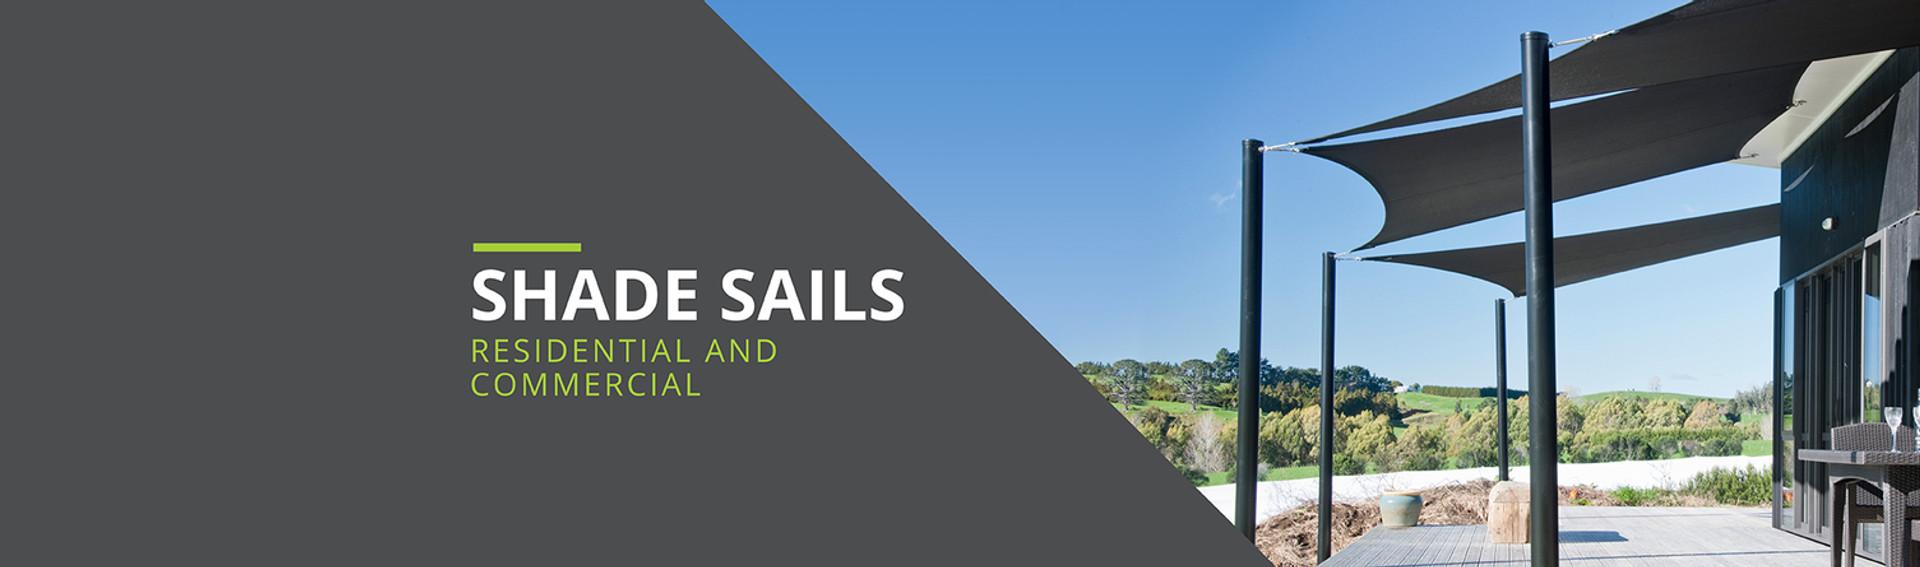 Shade Sail Banner.jpg